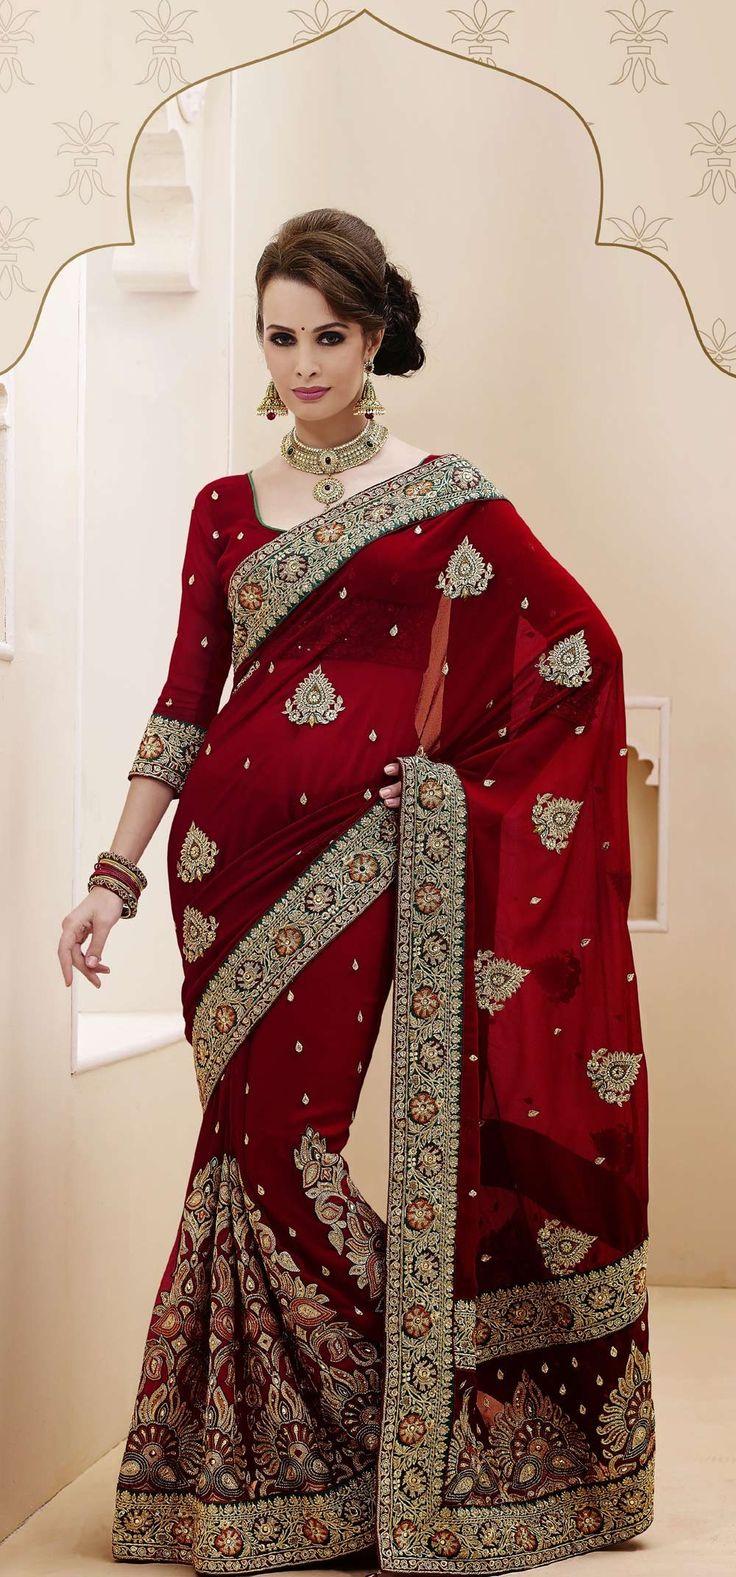 latest indian wedding sarees - photo #42